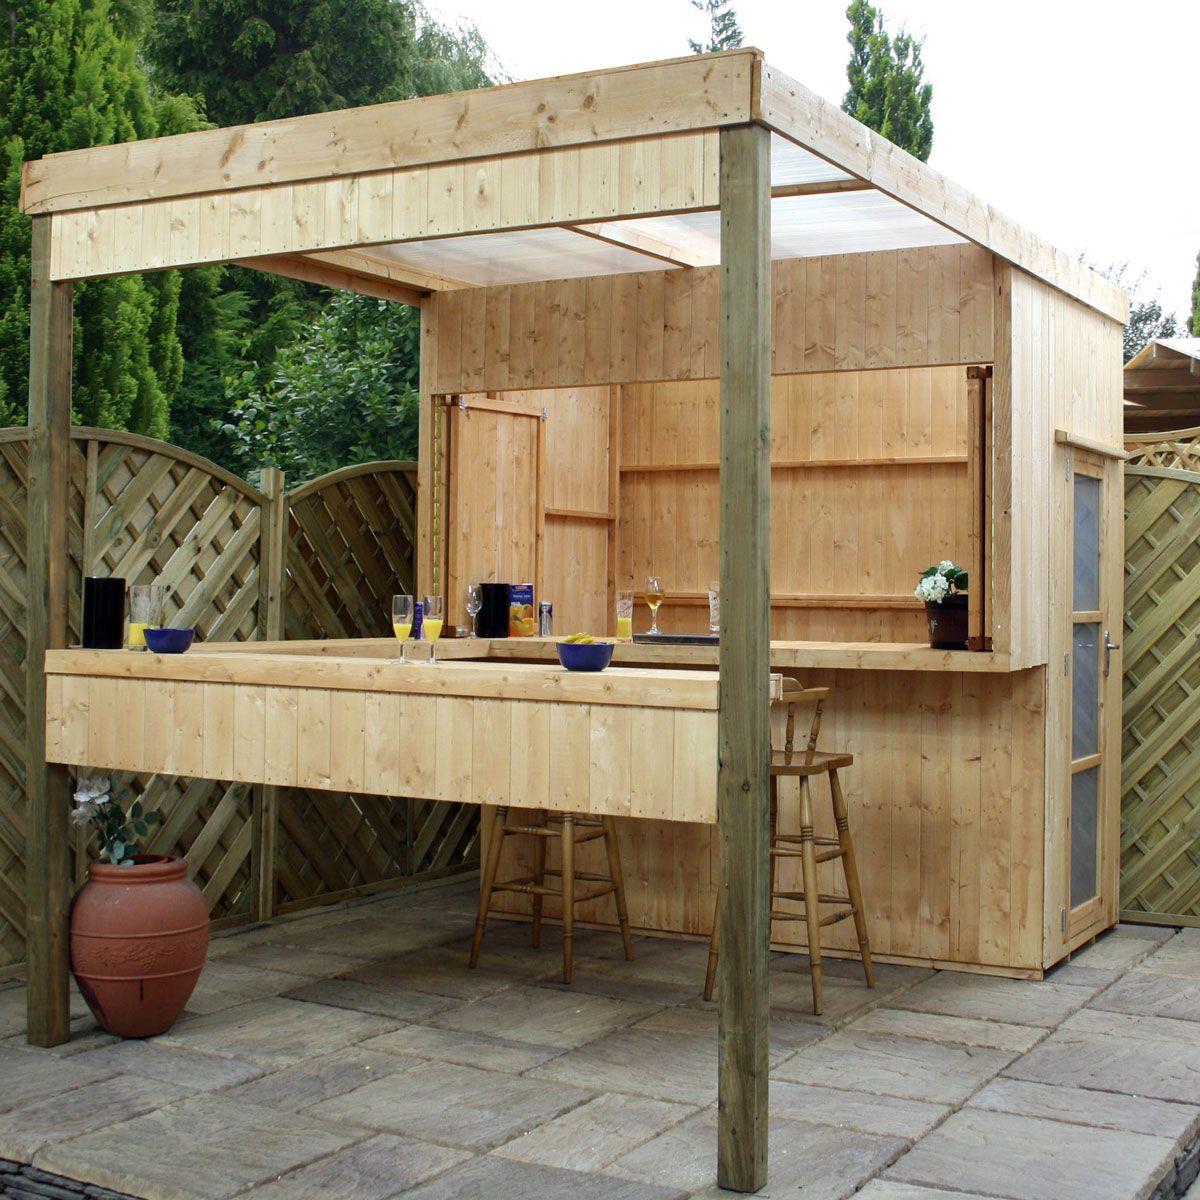 Backyard Bar Takapuna: Mercia Contemporary Shelter - Outdoor Bar